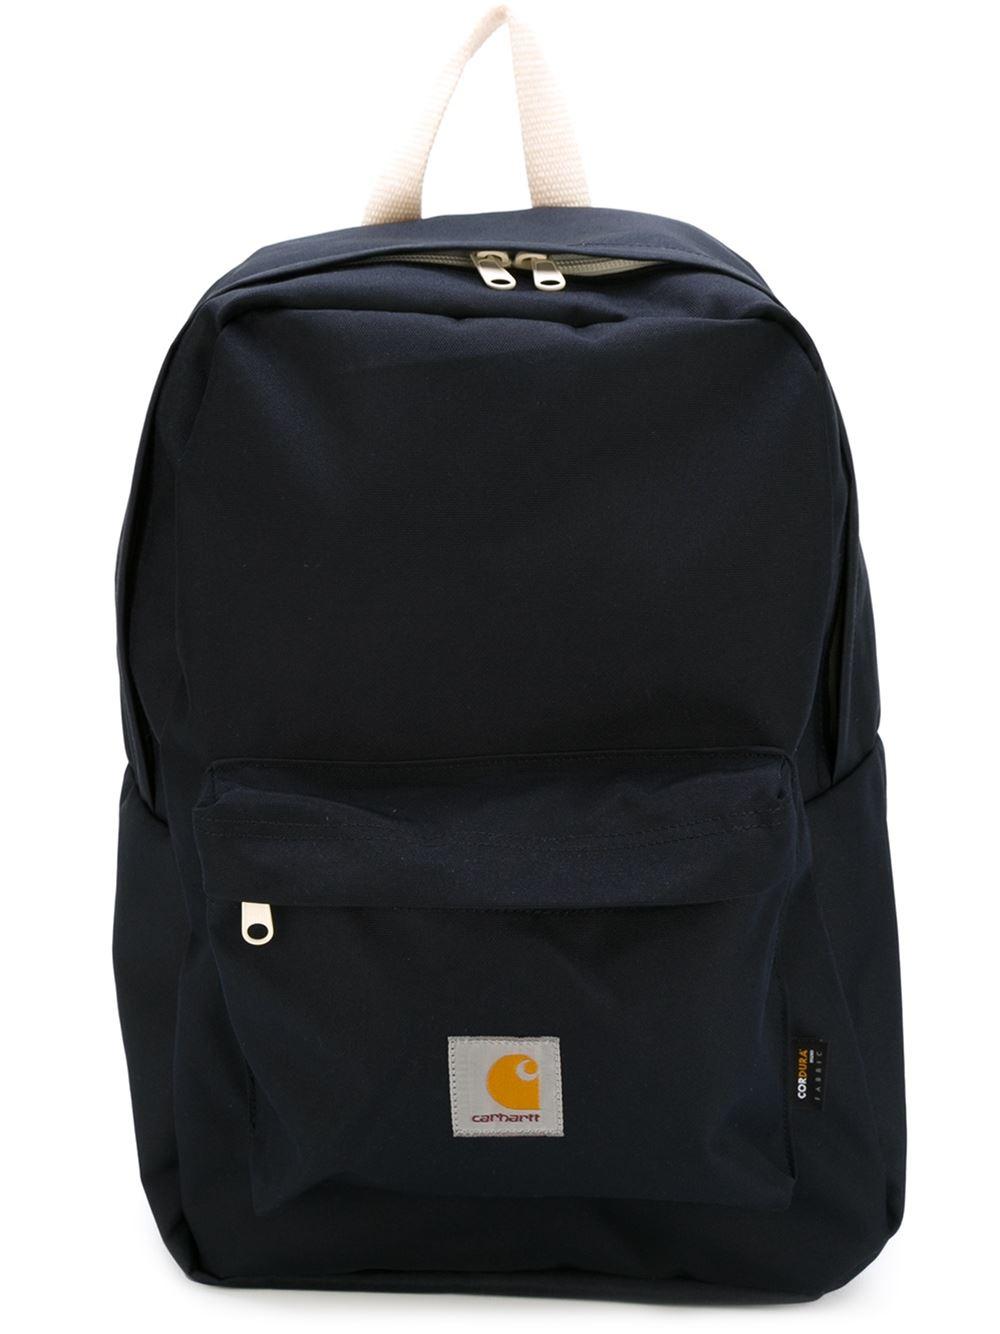 Carhartt Watch Backpack In Black For Men Lyst